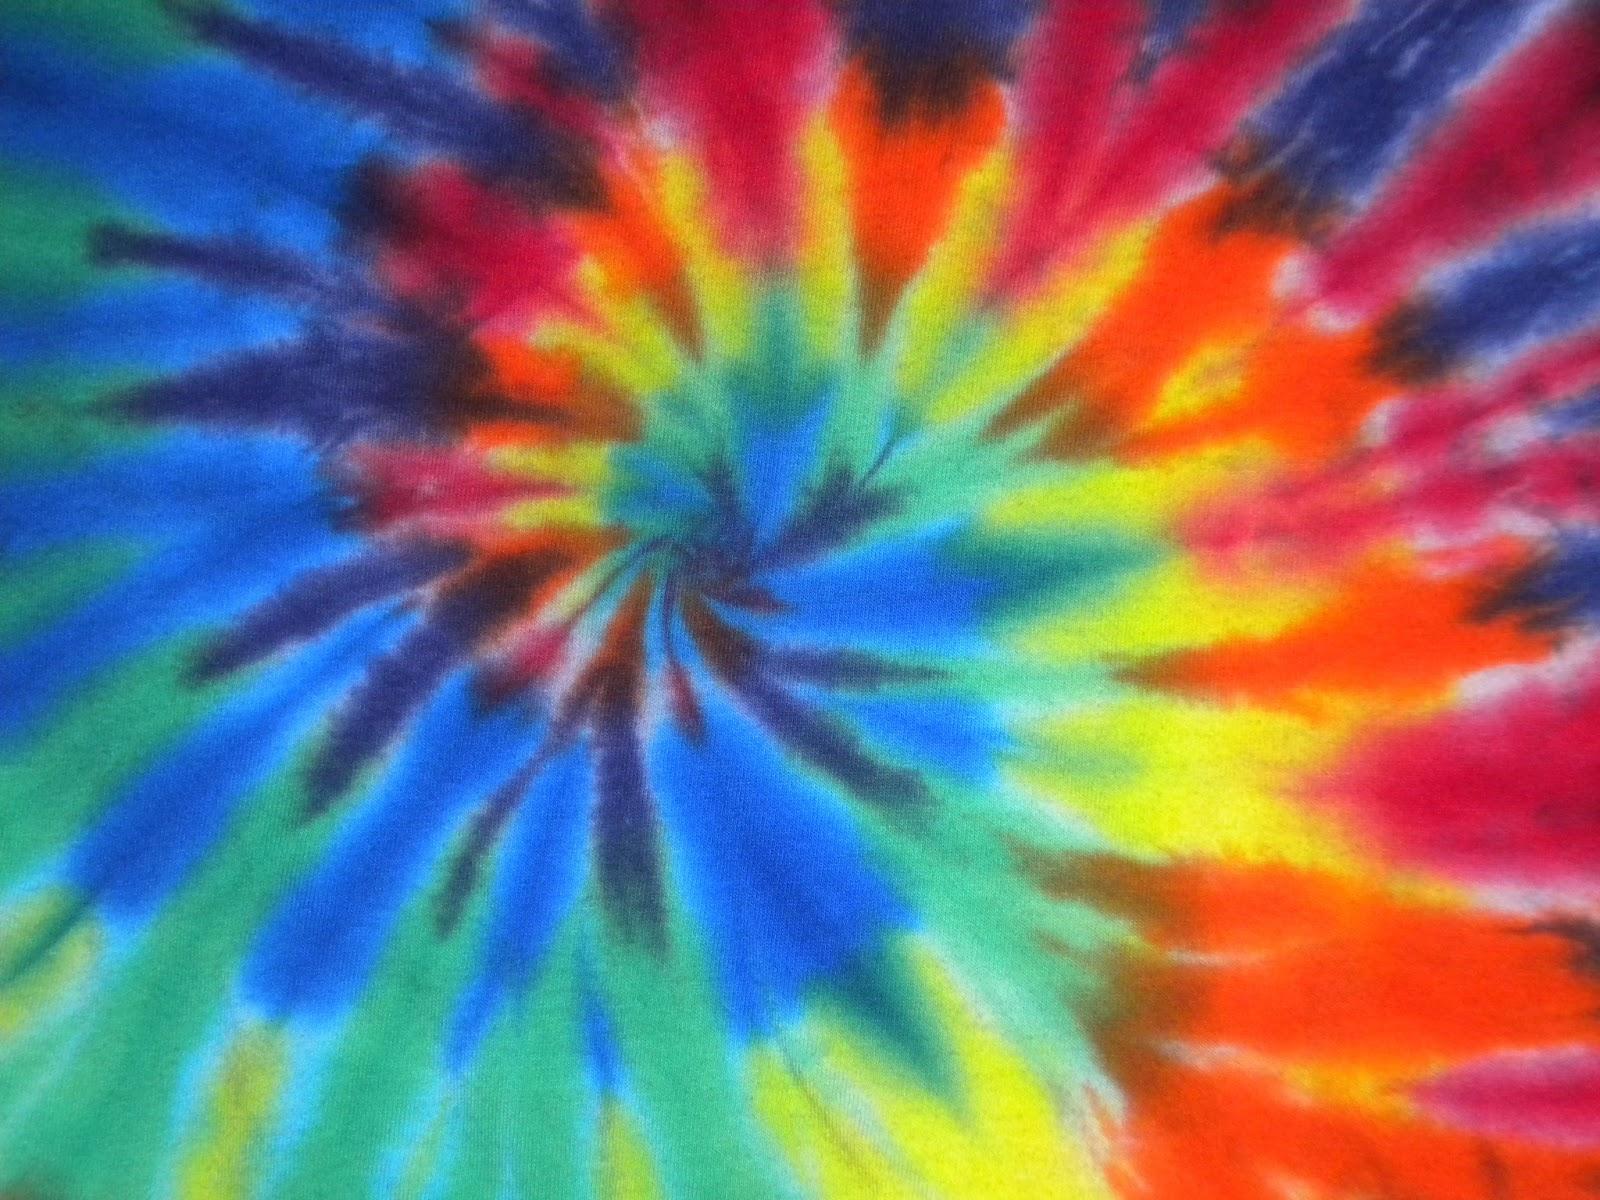 tie dye pictures photo - 1